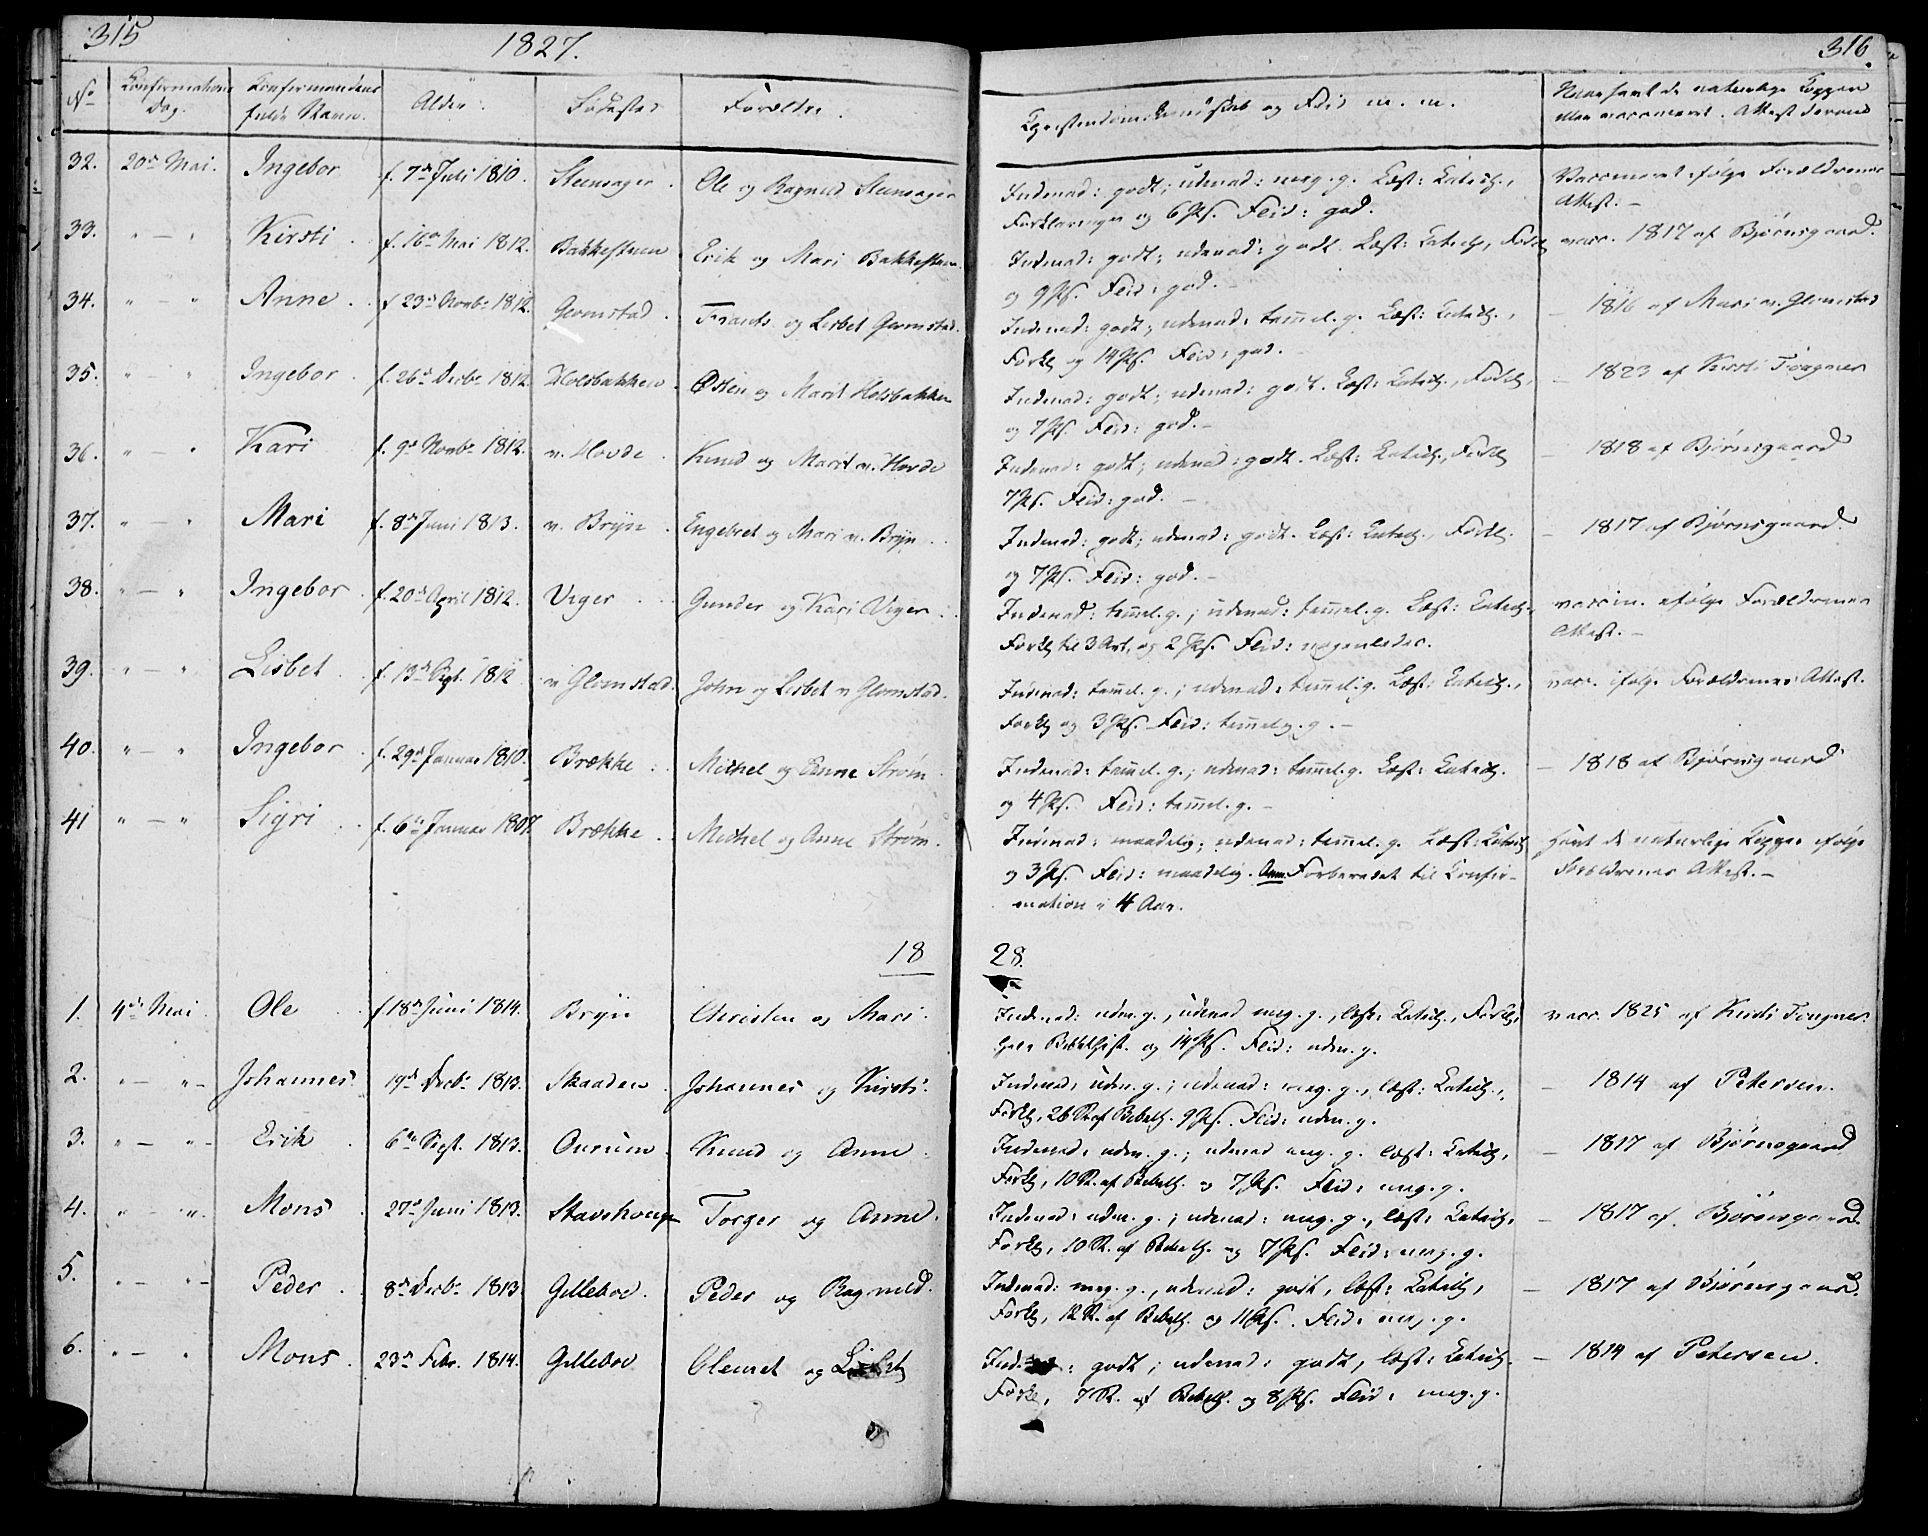 SAH, Øyer prestekontor, Ministerialbok nr. 4, 1824-1841, s. 315-316